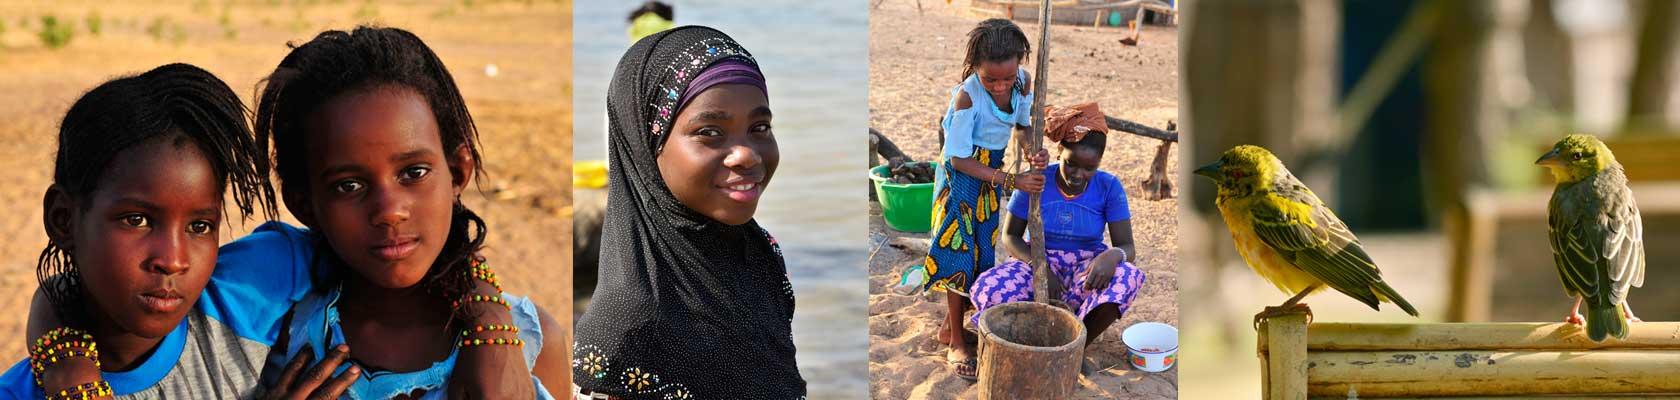 Montage photos du Sénégal